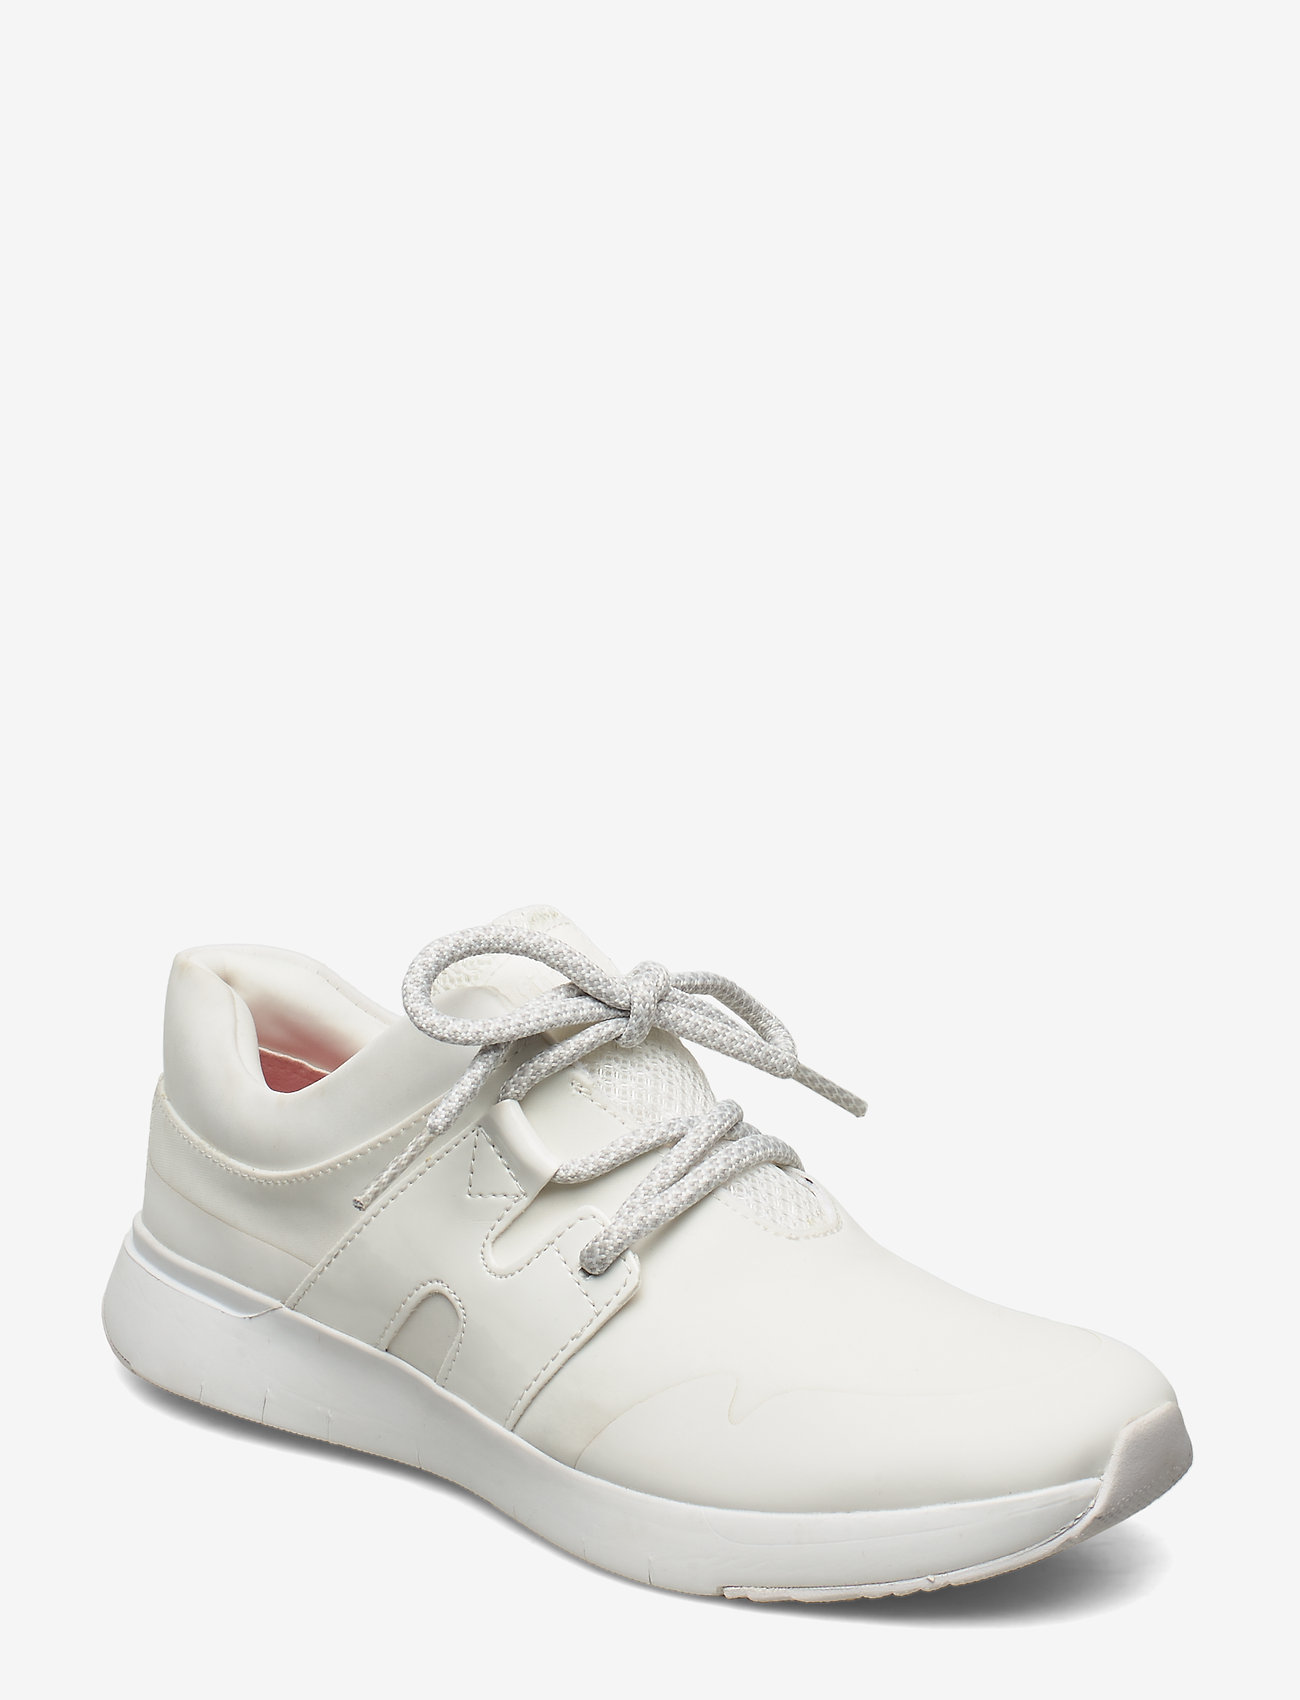 Anni Flex Sneakers (Urban White) (58.50